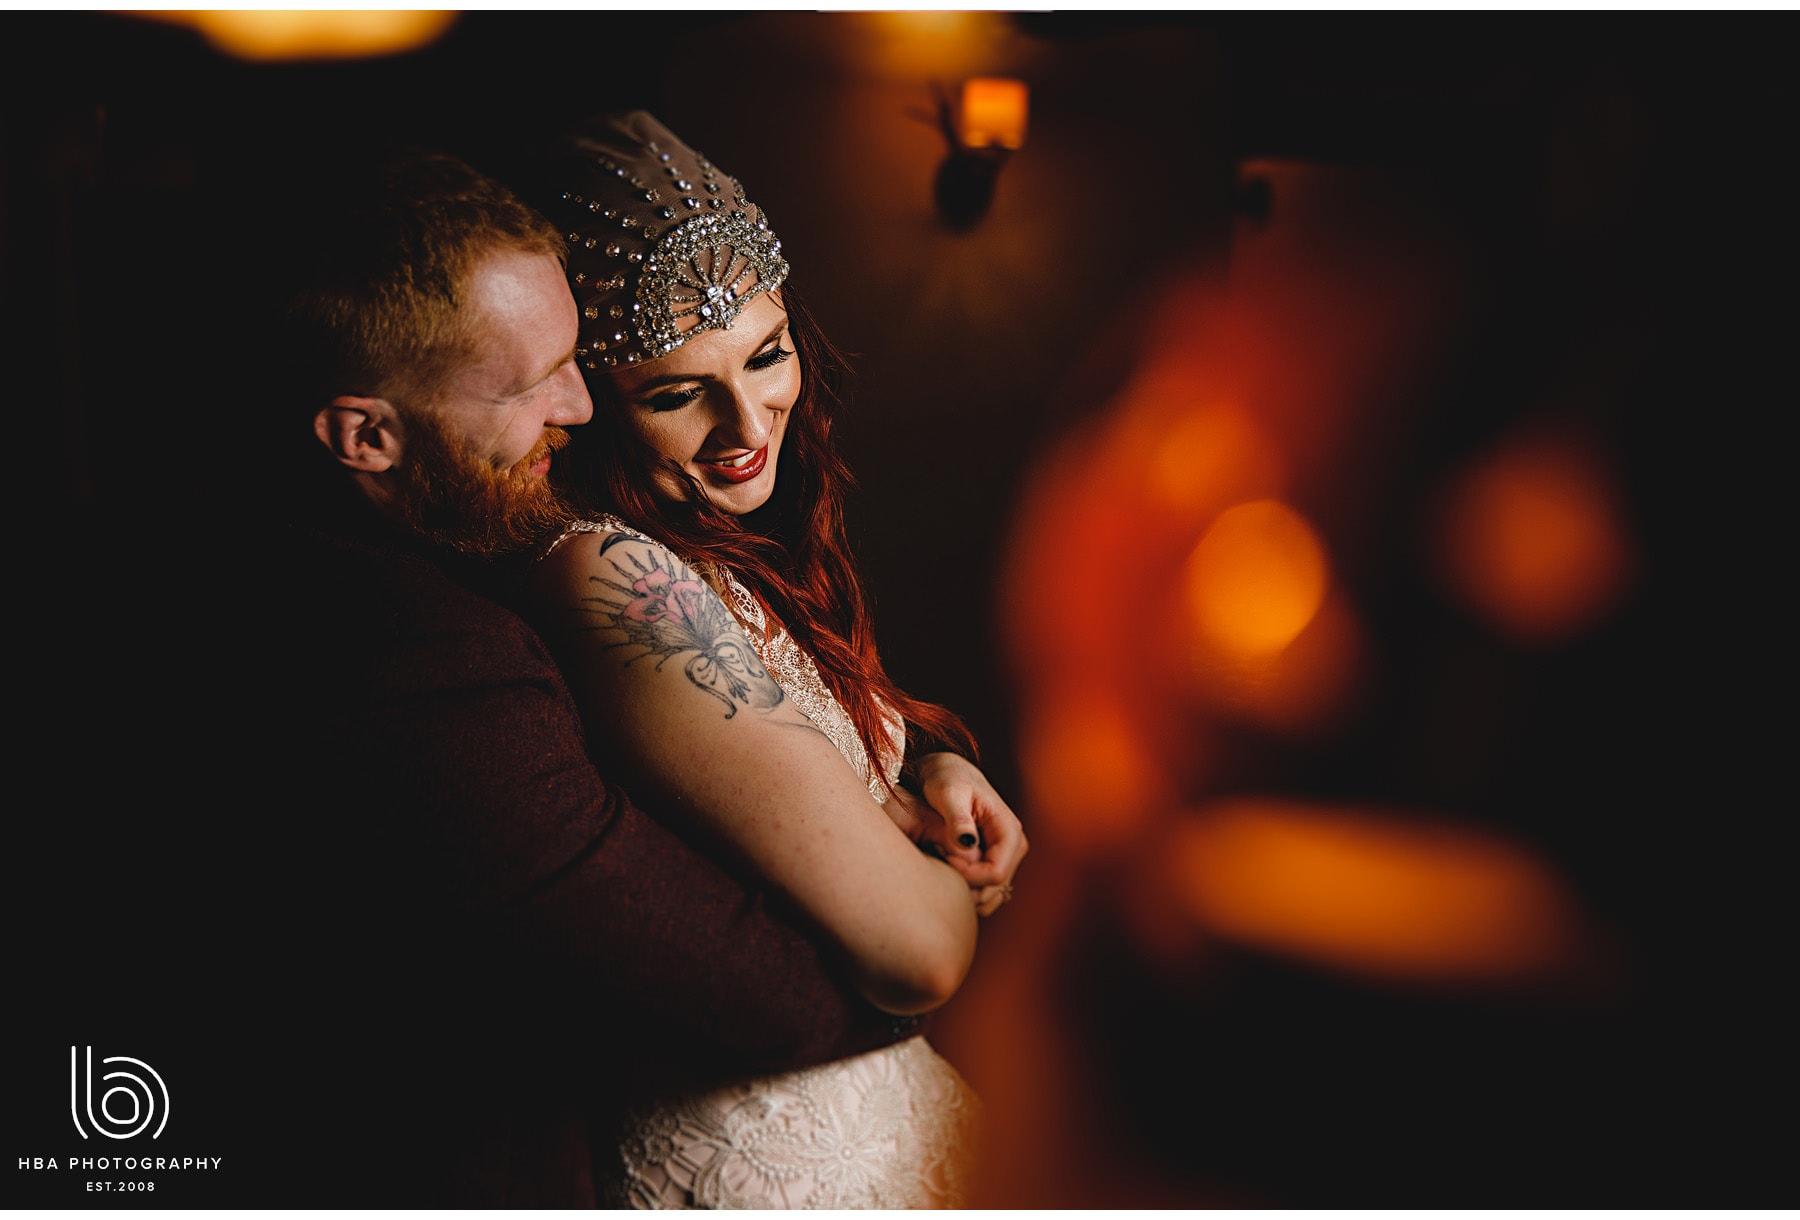 the bride & groom cudding in the orange light